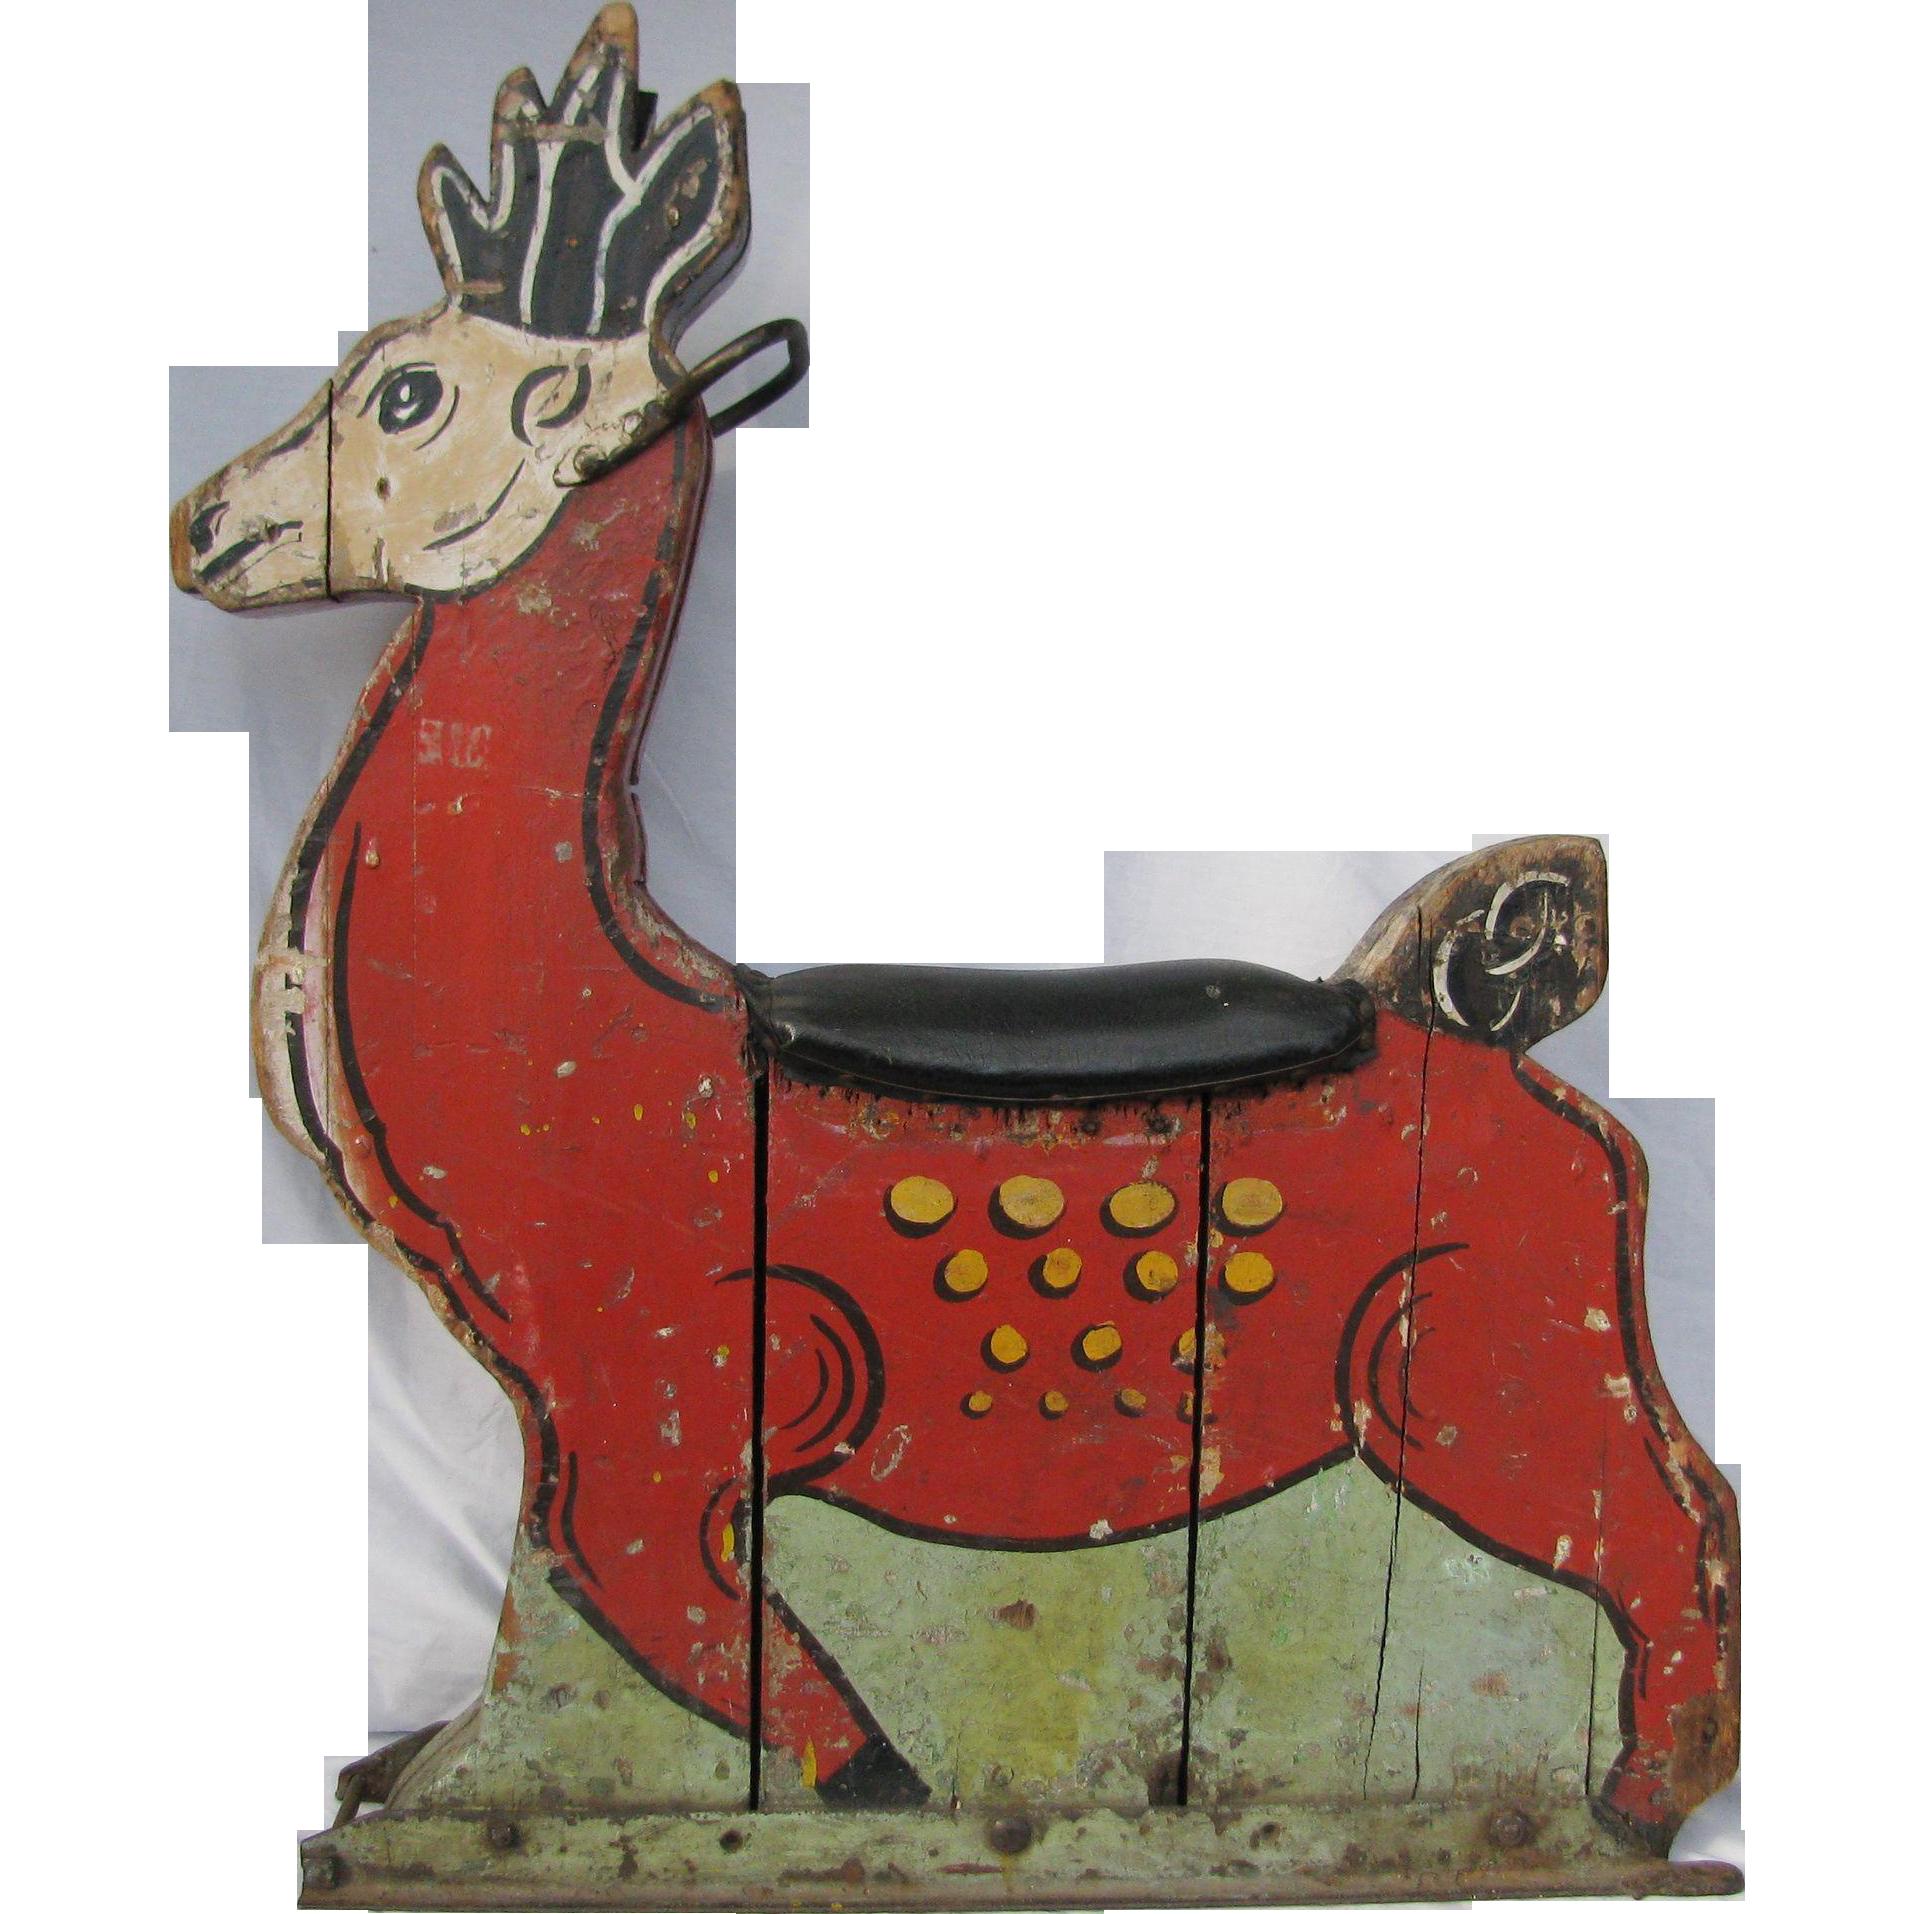 Antique carousel ride vintage. Games clipart reindeer game